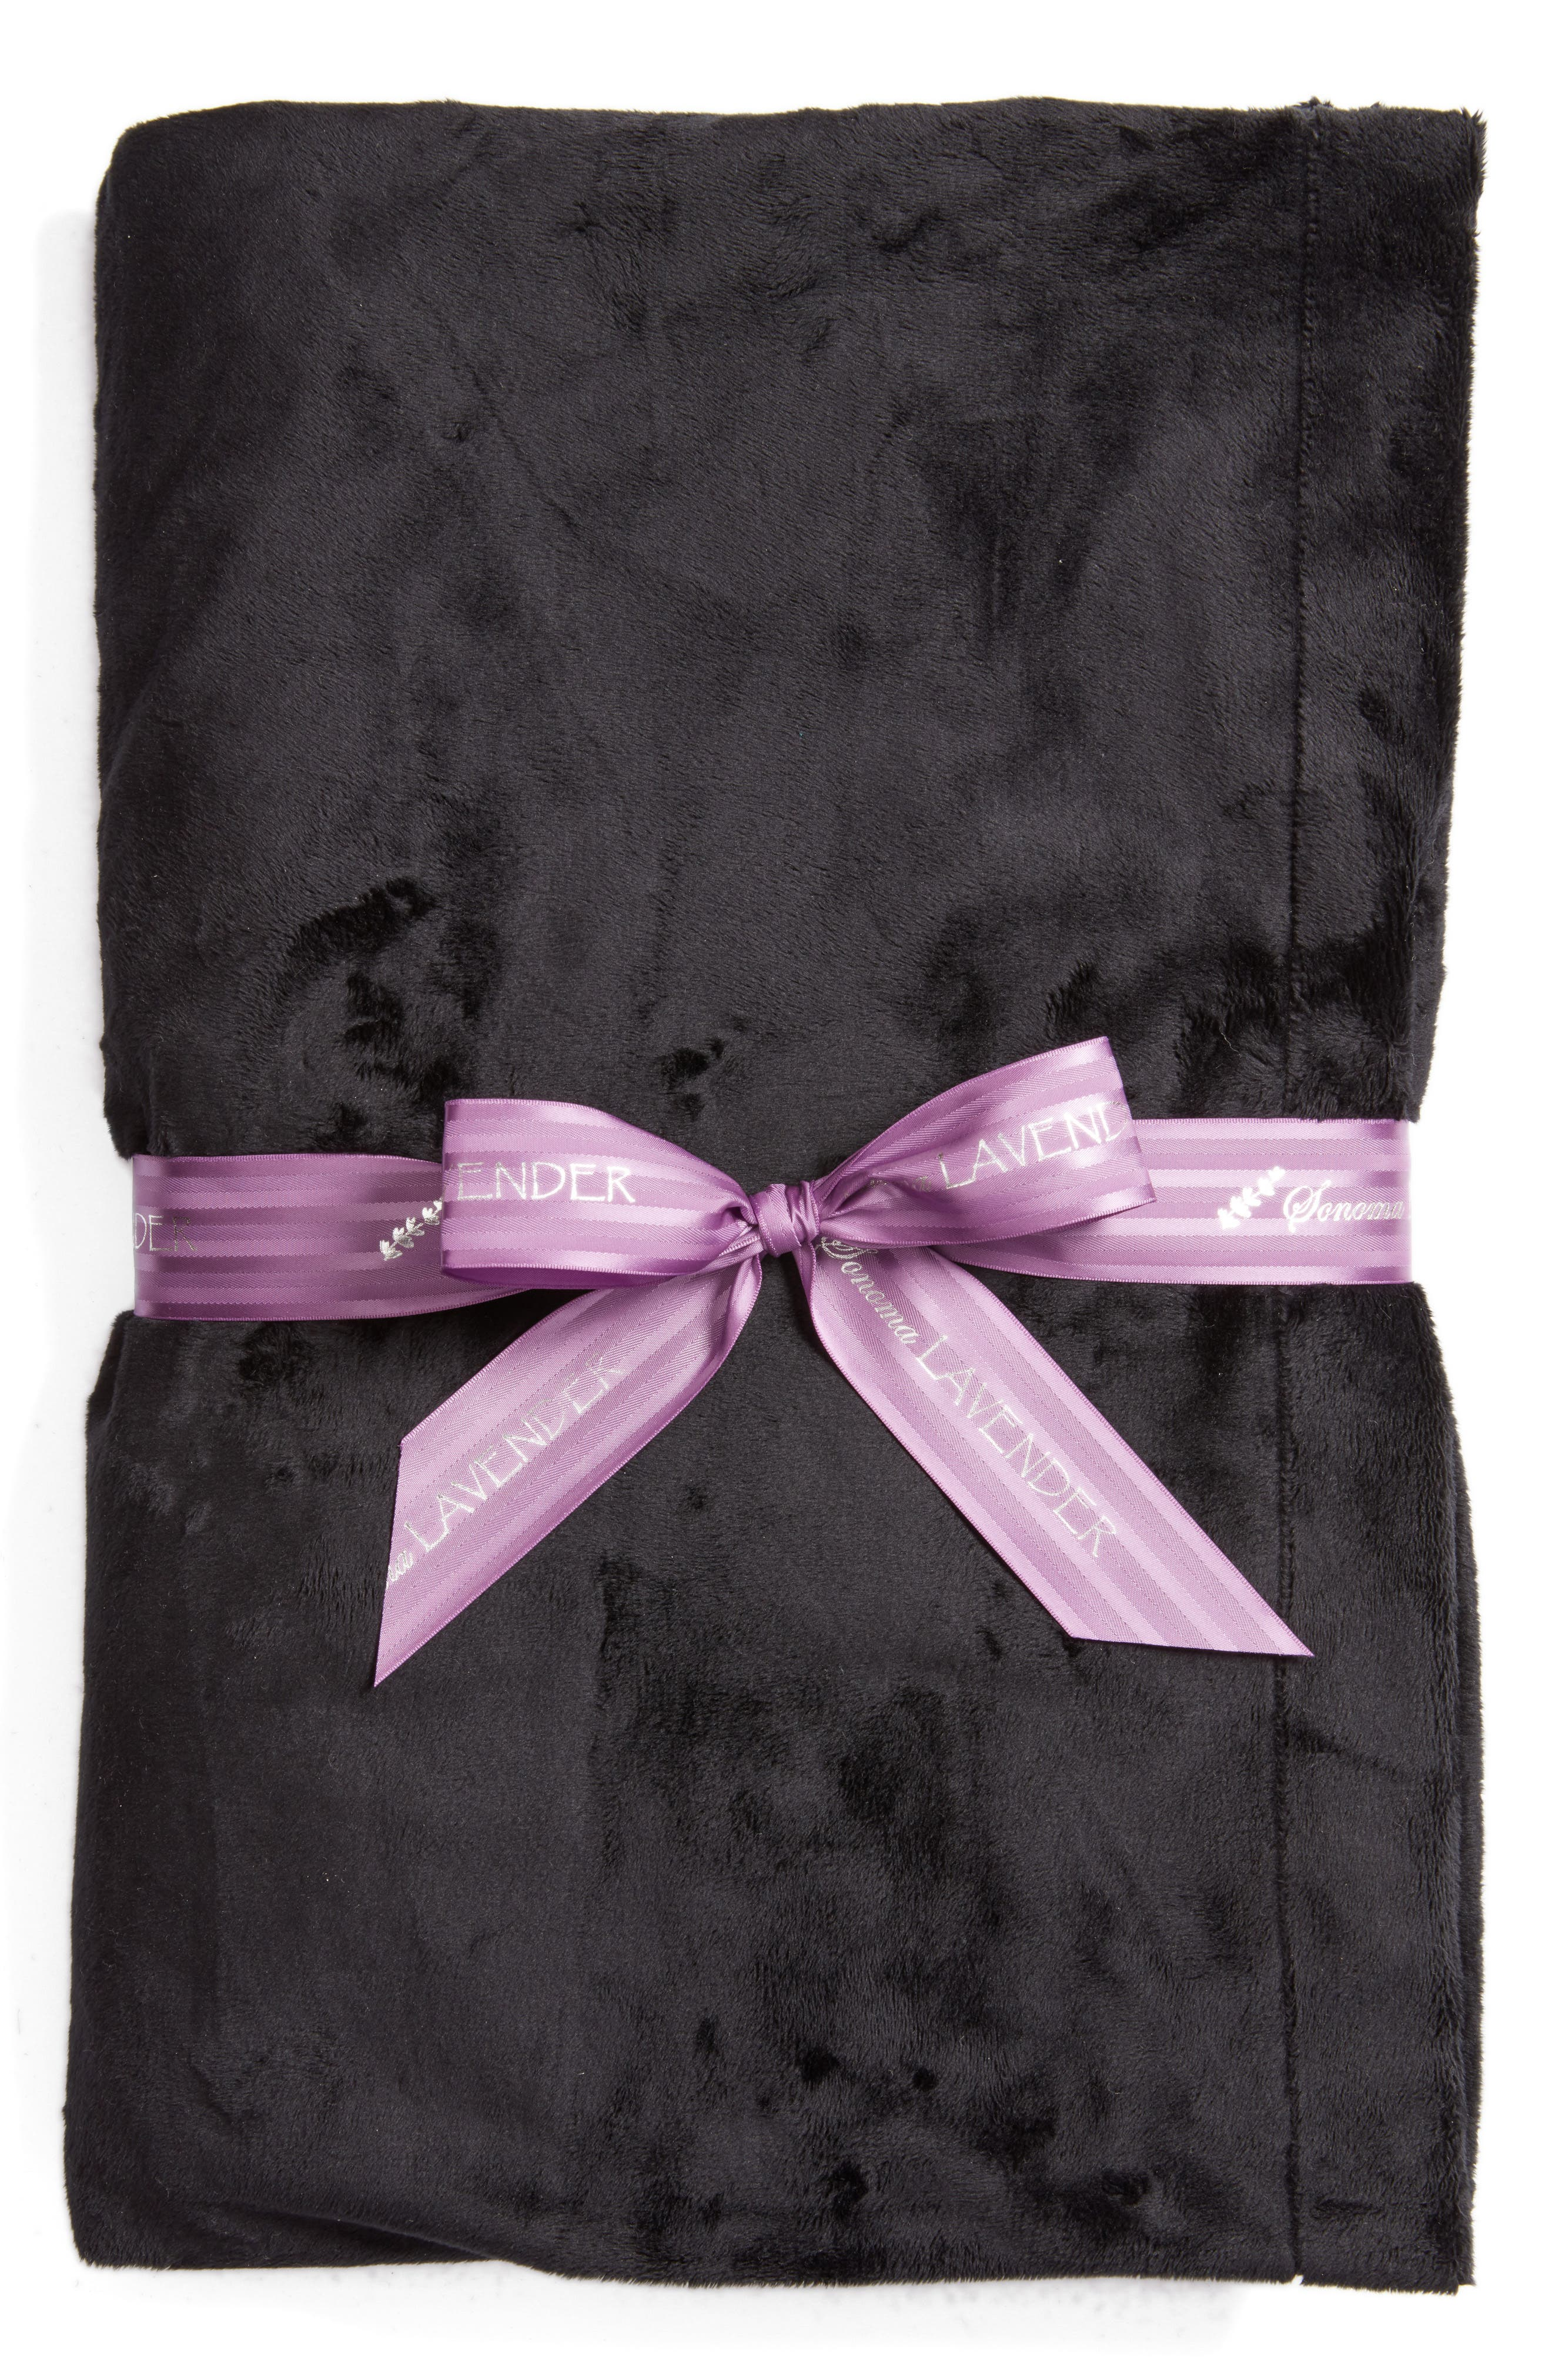 Sonoma Lavender Solid Black Blankie